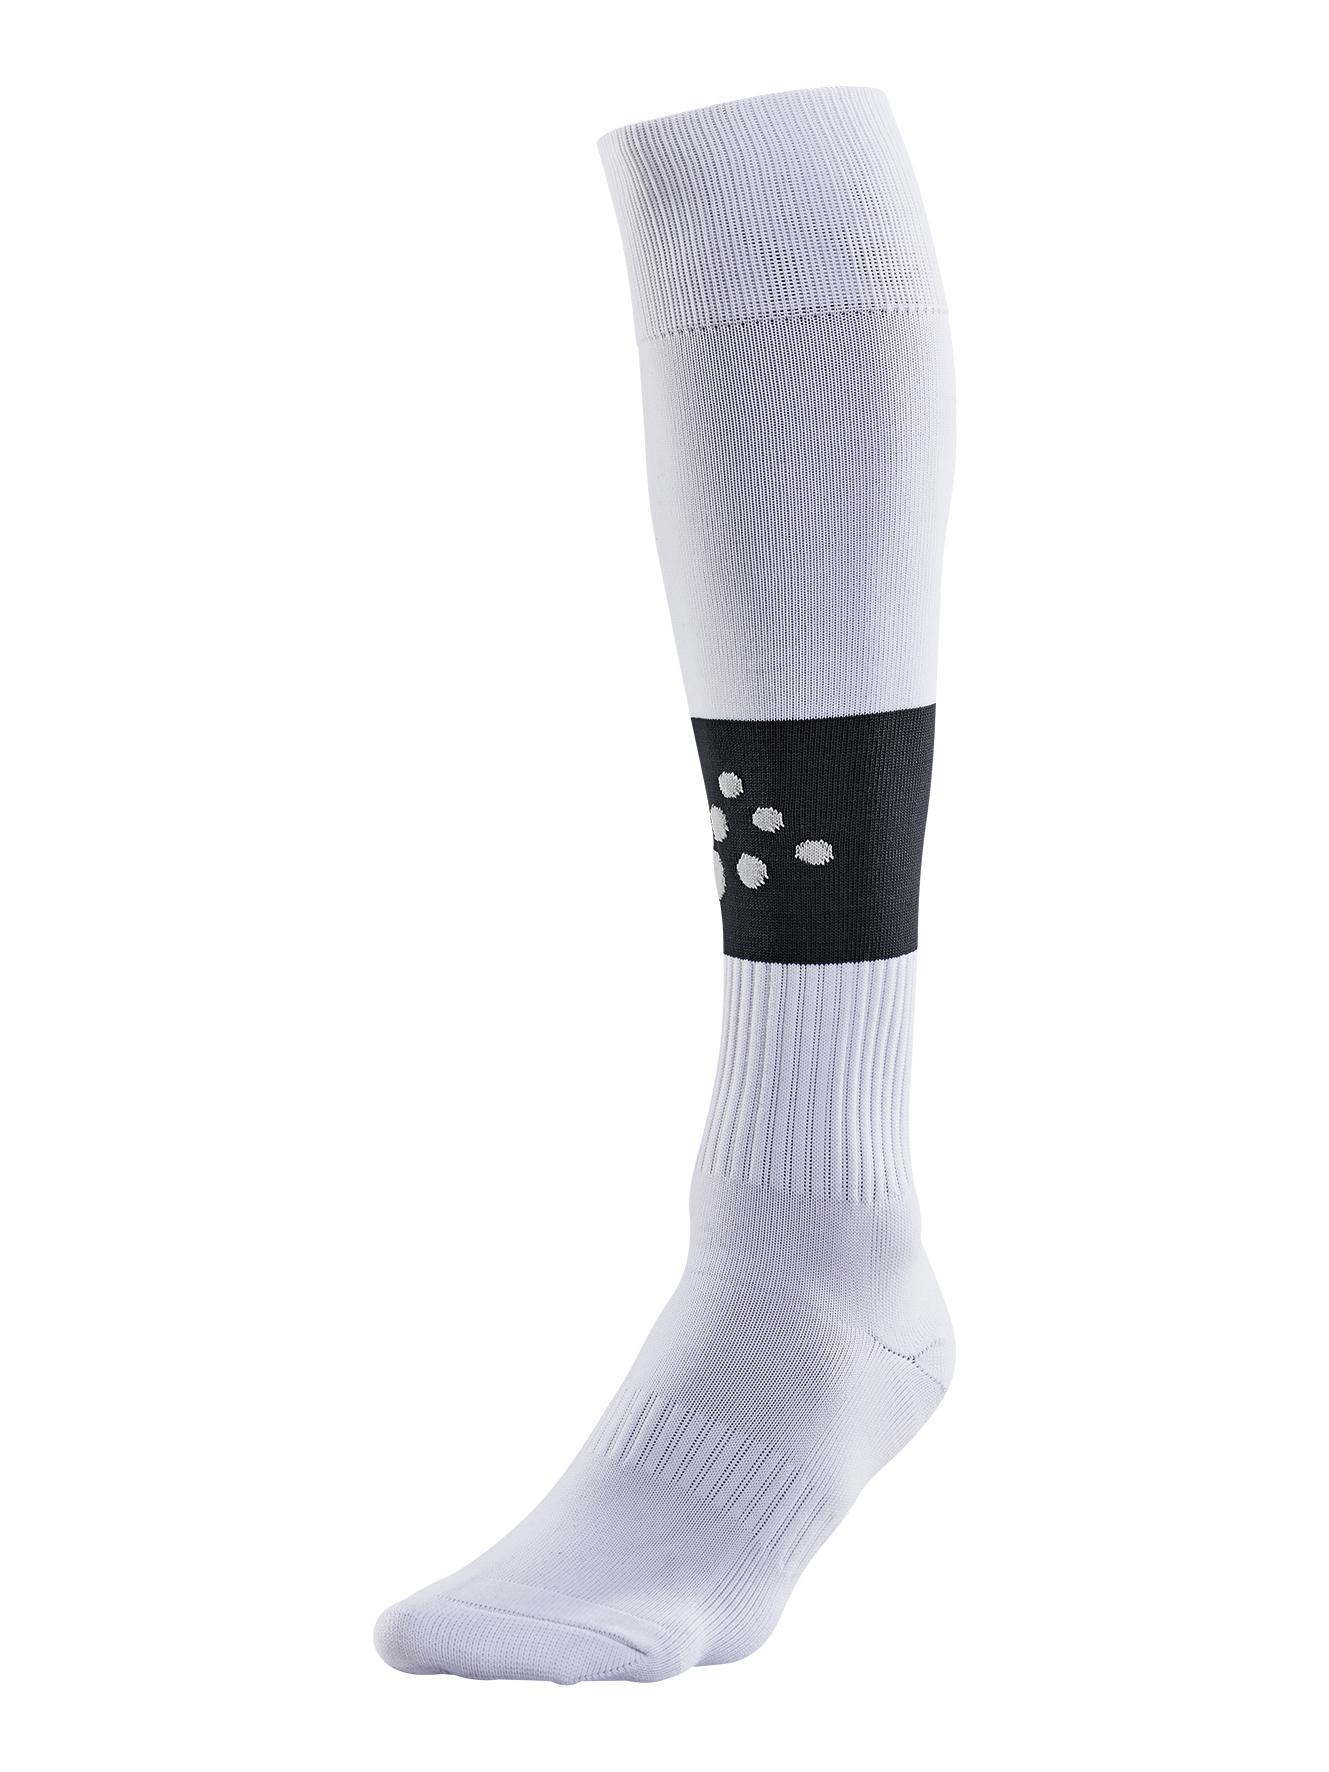 Craft Squad Contrast Stocking Senior - White / Black - 46/48